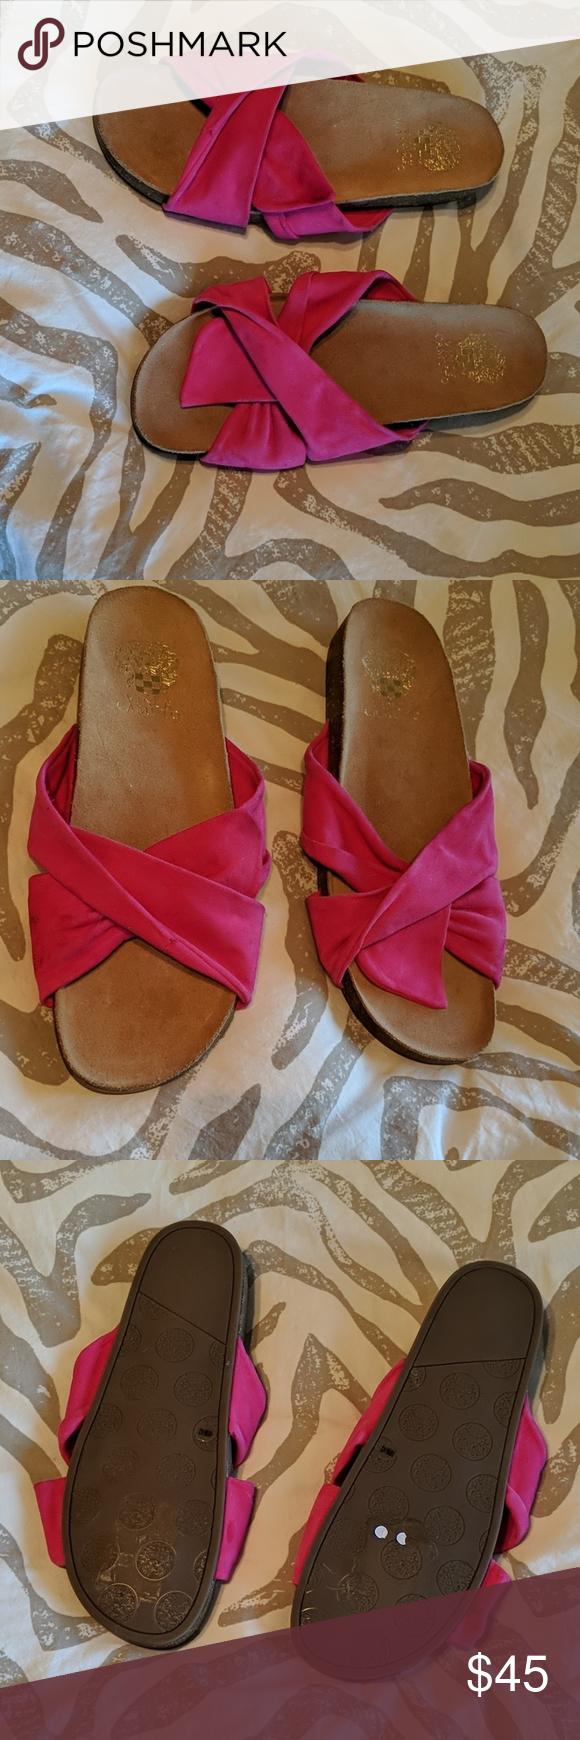 dd47618f4aac Vince Camuto Berulia suede slide sandal Nwot vince camuto pink suede sandal.  These are new